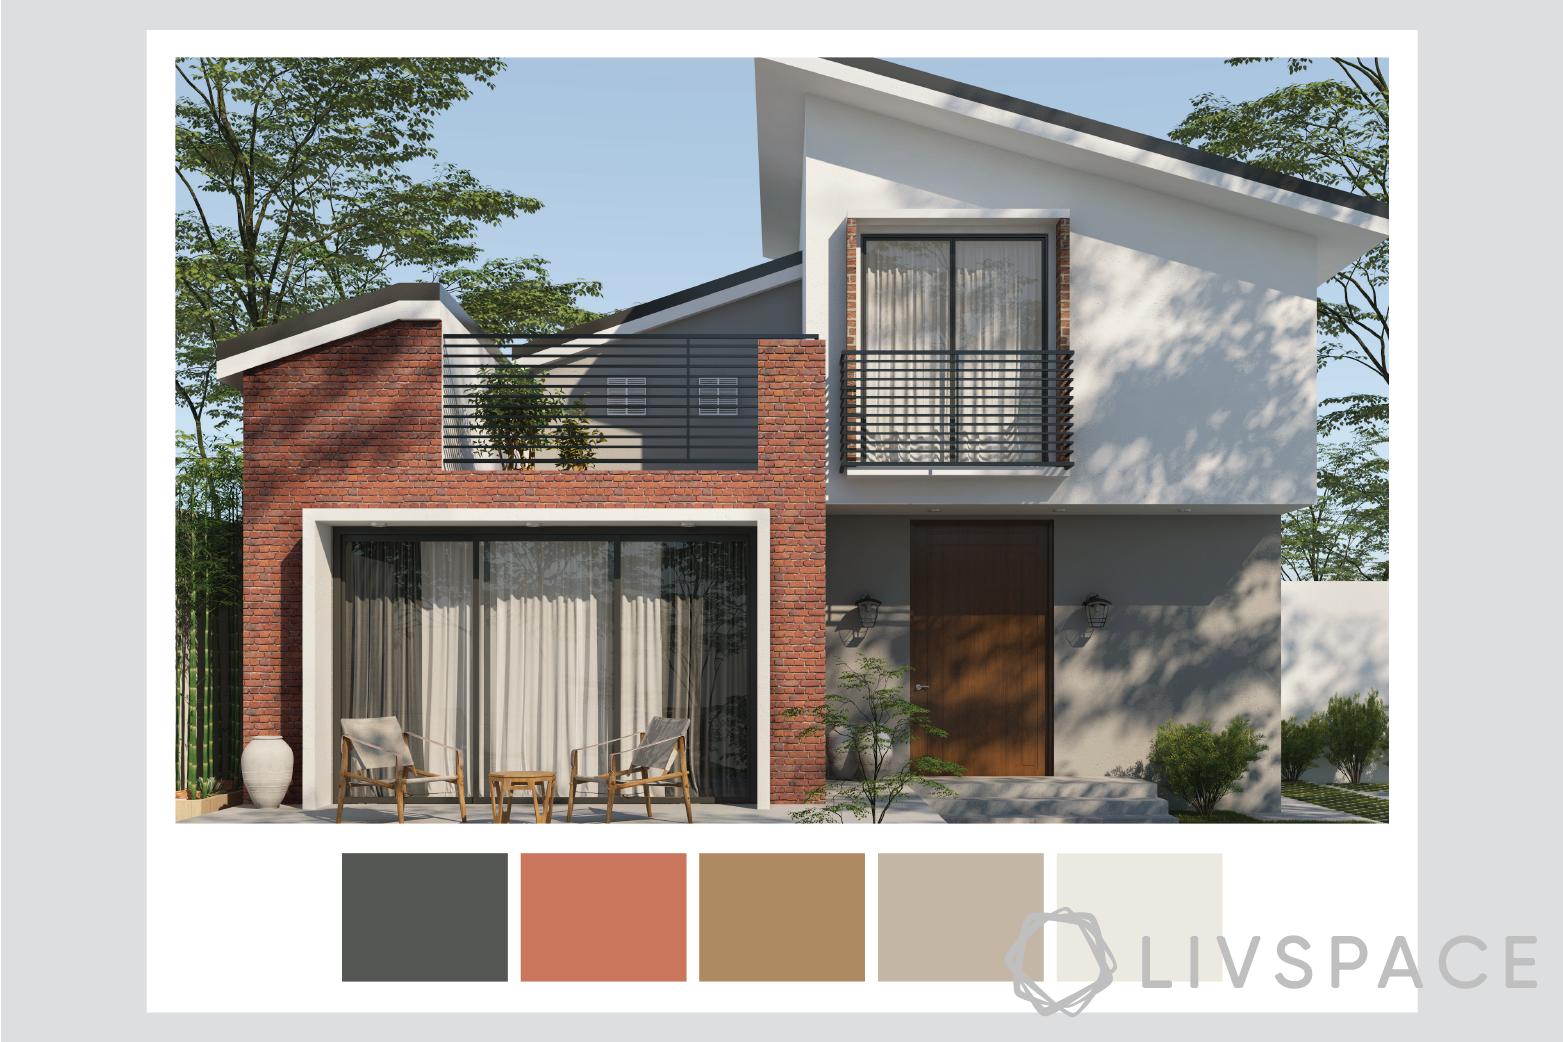 exterior house paint-textured walls-scandinavian style